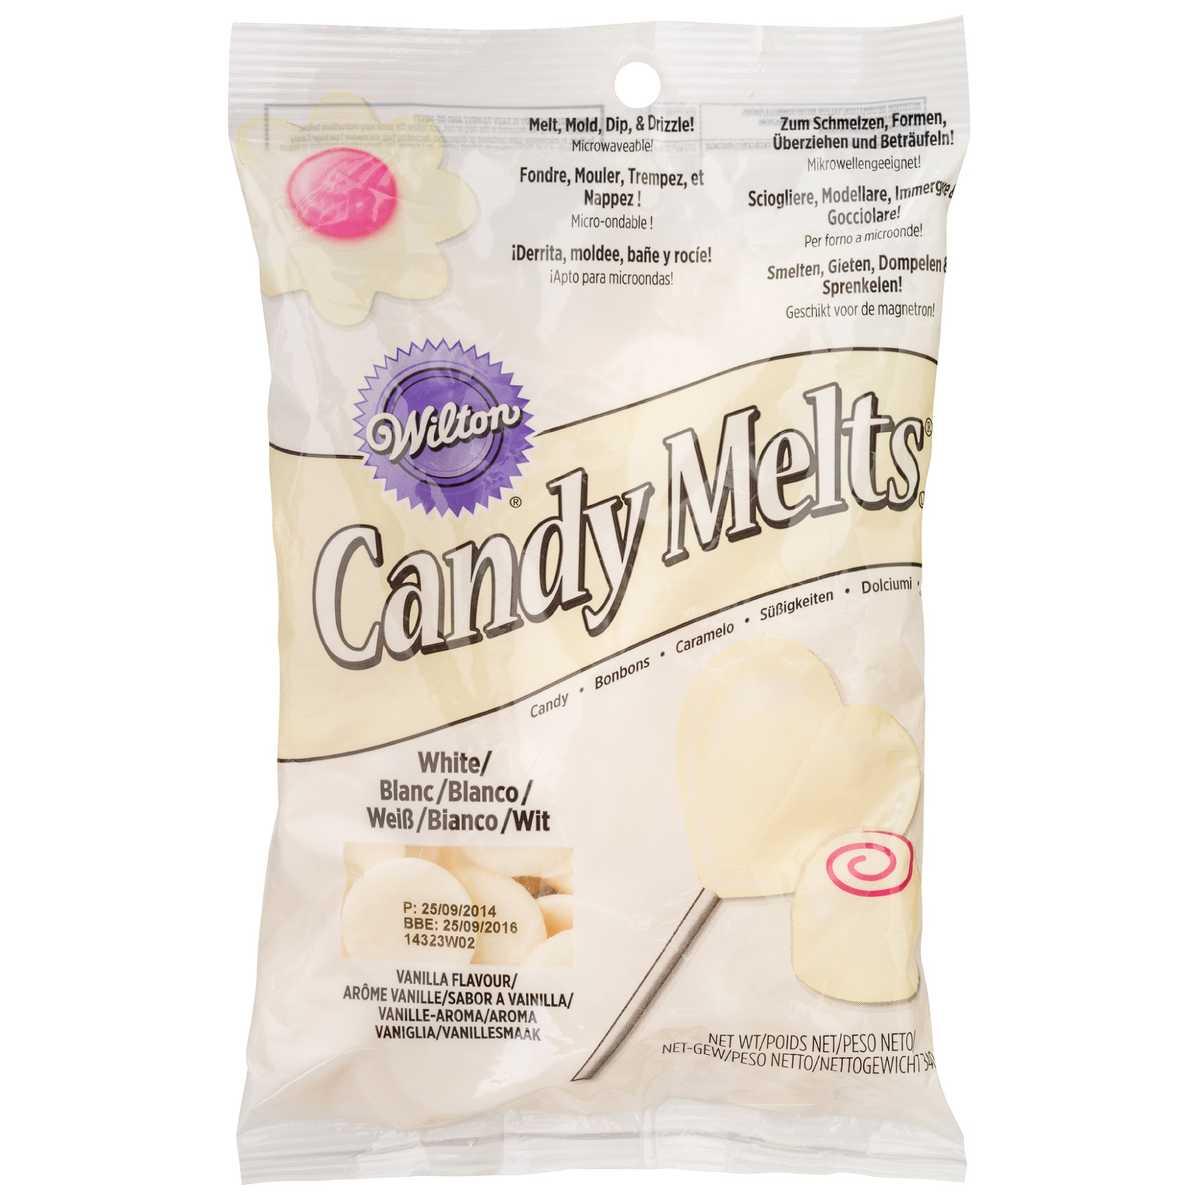 Chocolate Nonpareils White Dunmore Candy Kitchen: WILTON WHITE CANDY MELTS